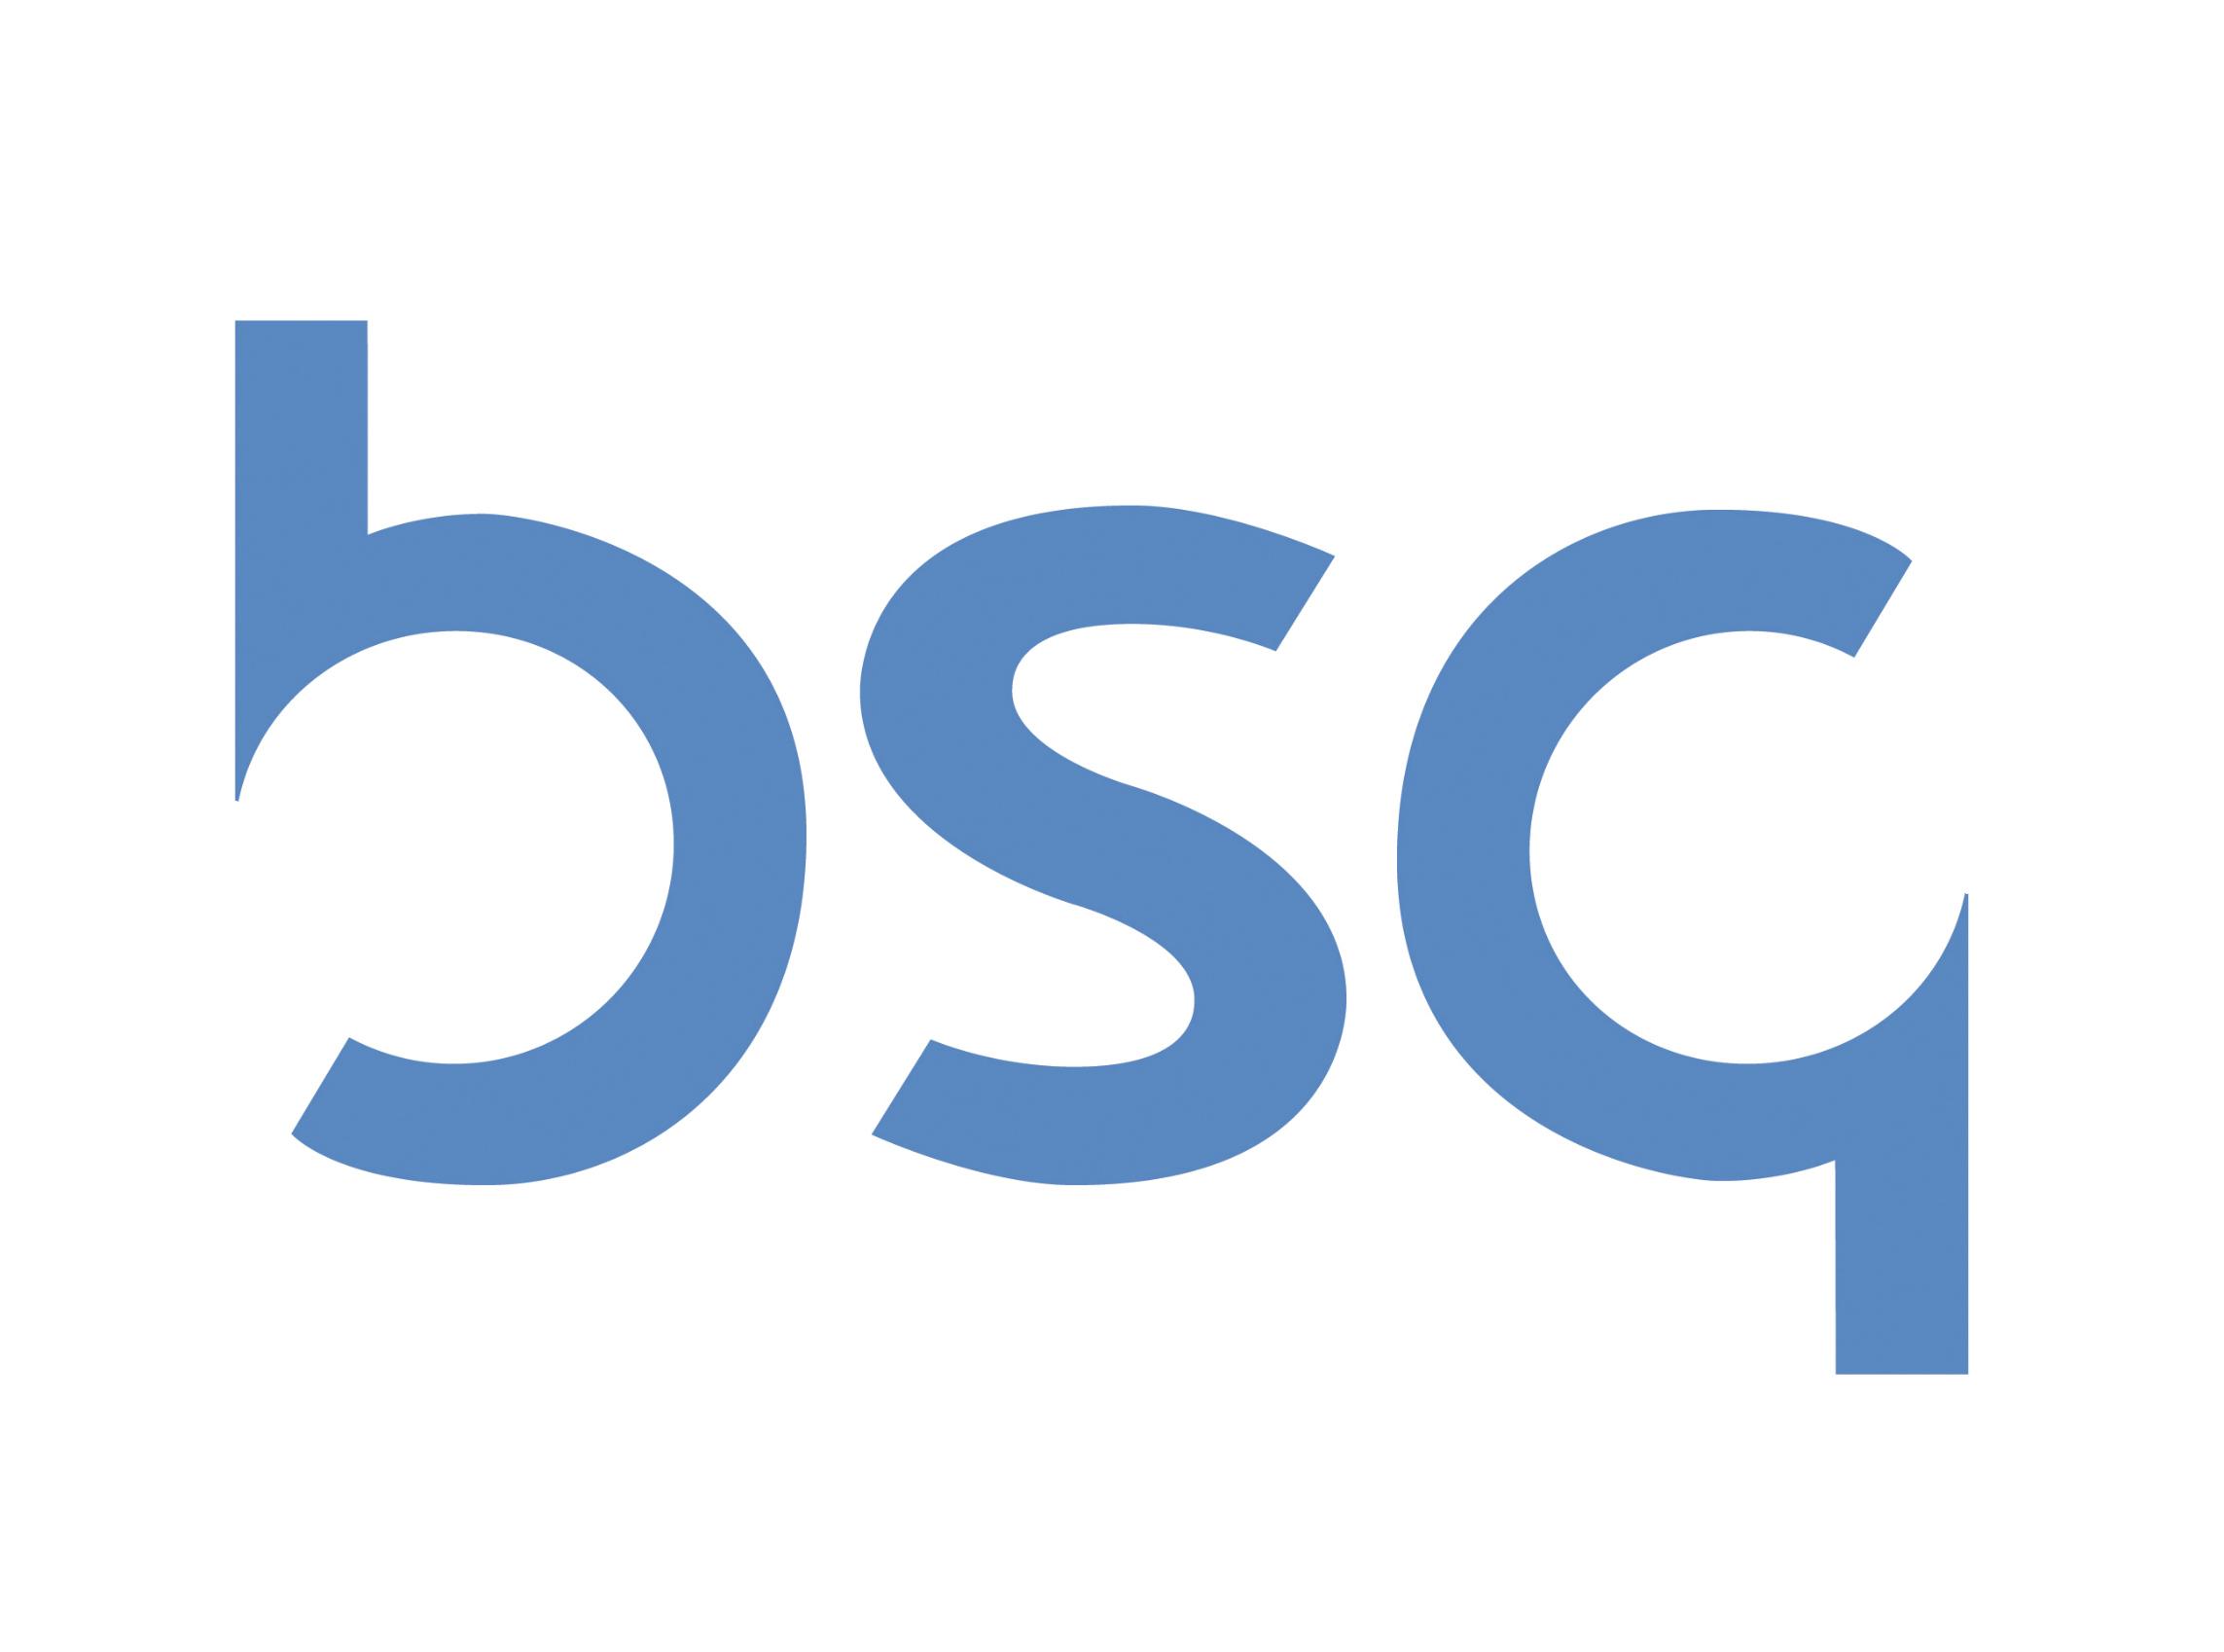 bsg_rgbword_big_no_url